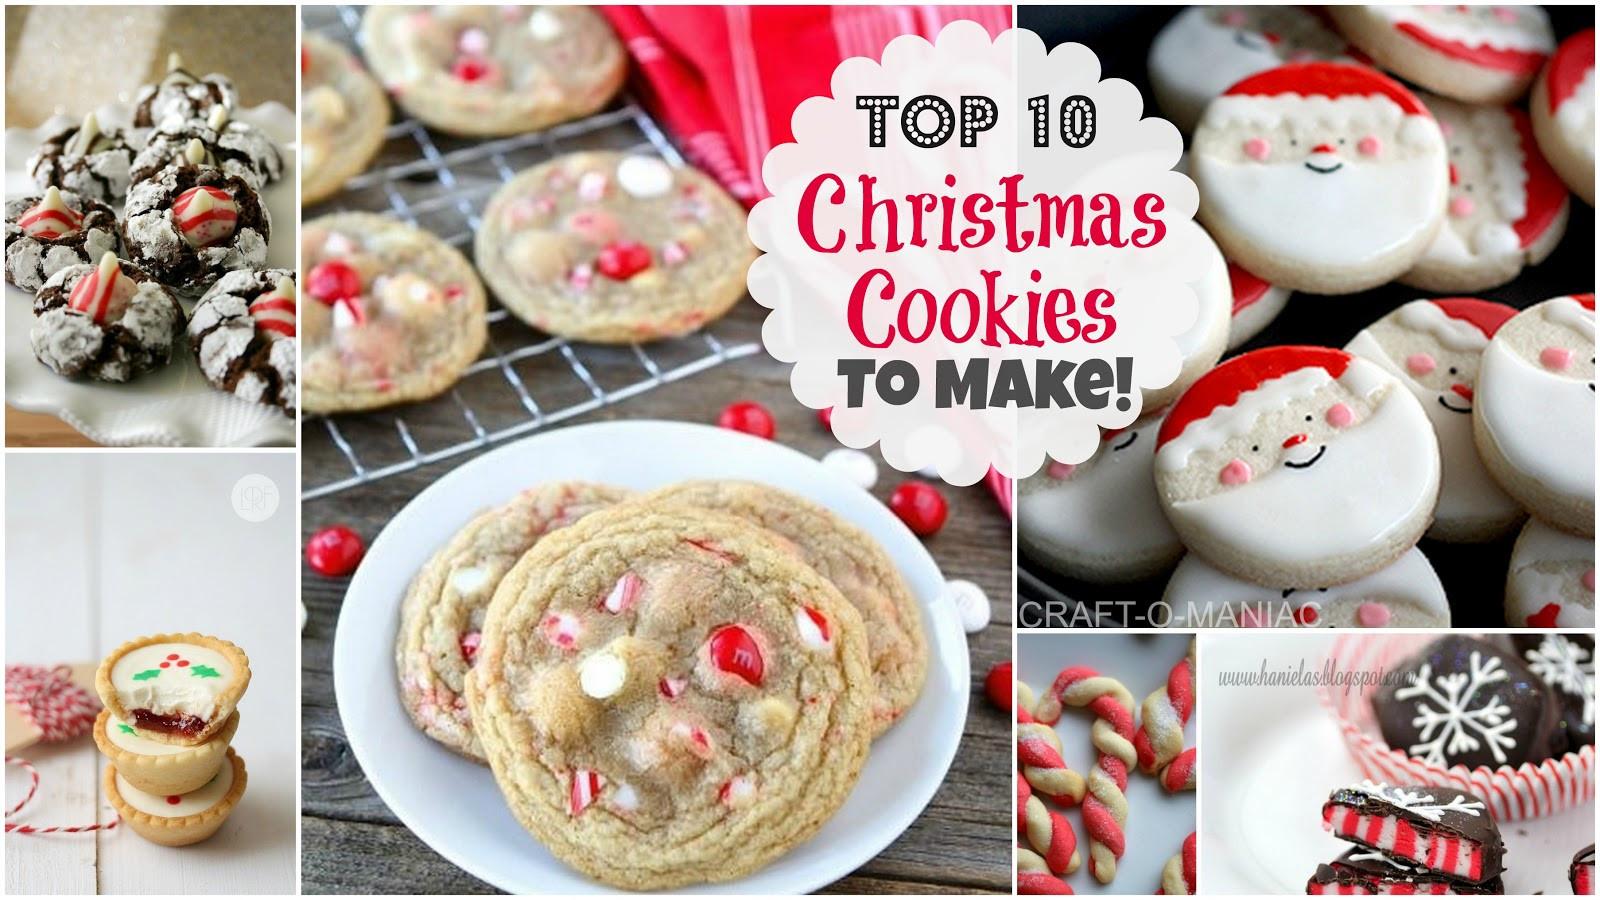 Best Christmas Cookies To Make  Top 10 Christmas Cookies to Make Craft O Maniac